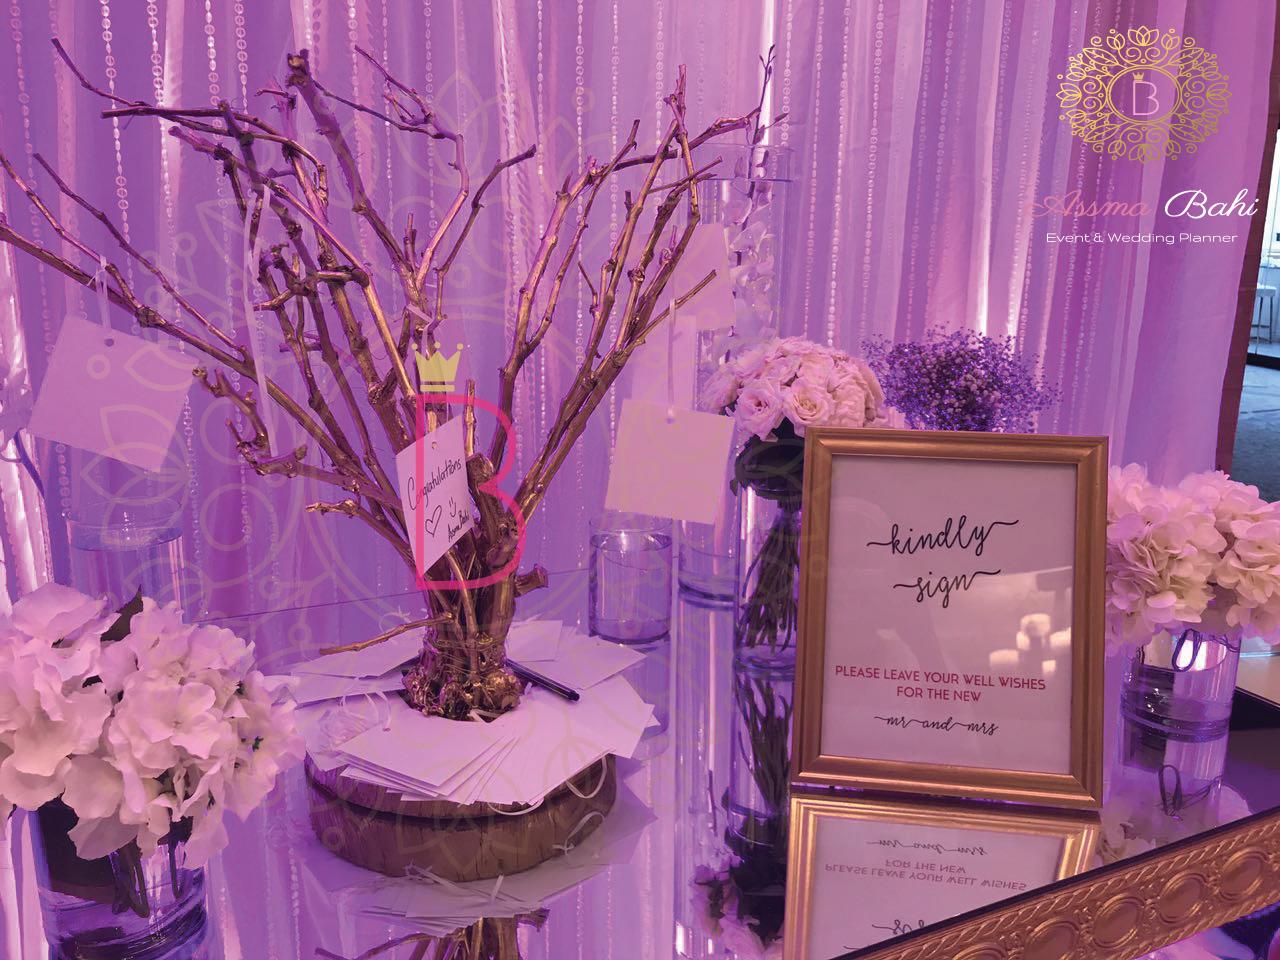 Assma Bahi | Event & Wedding Planner